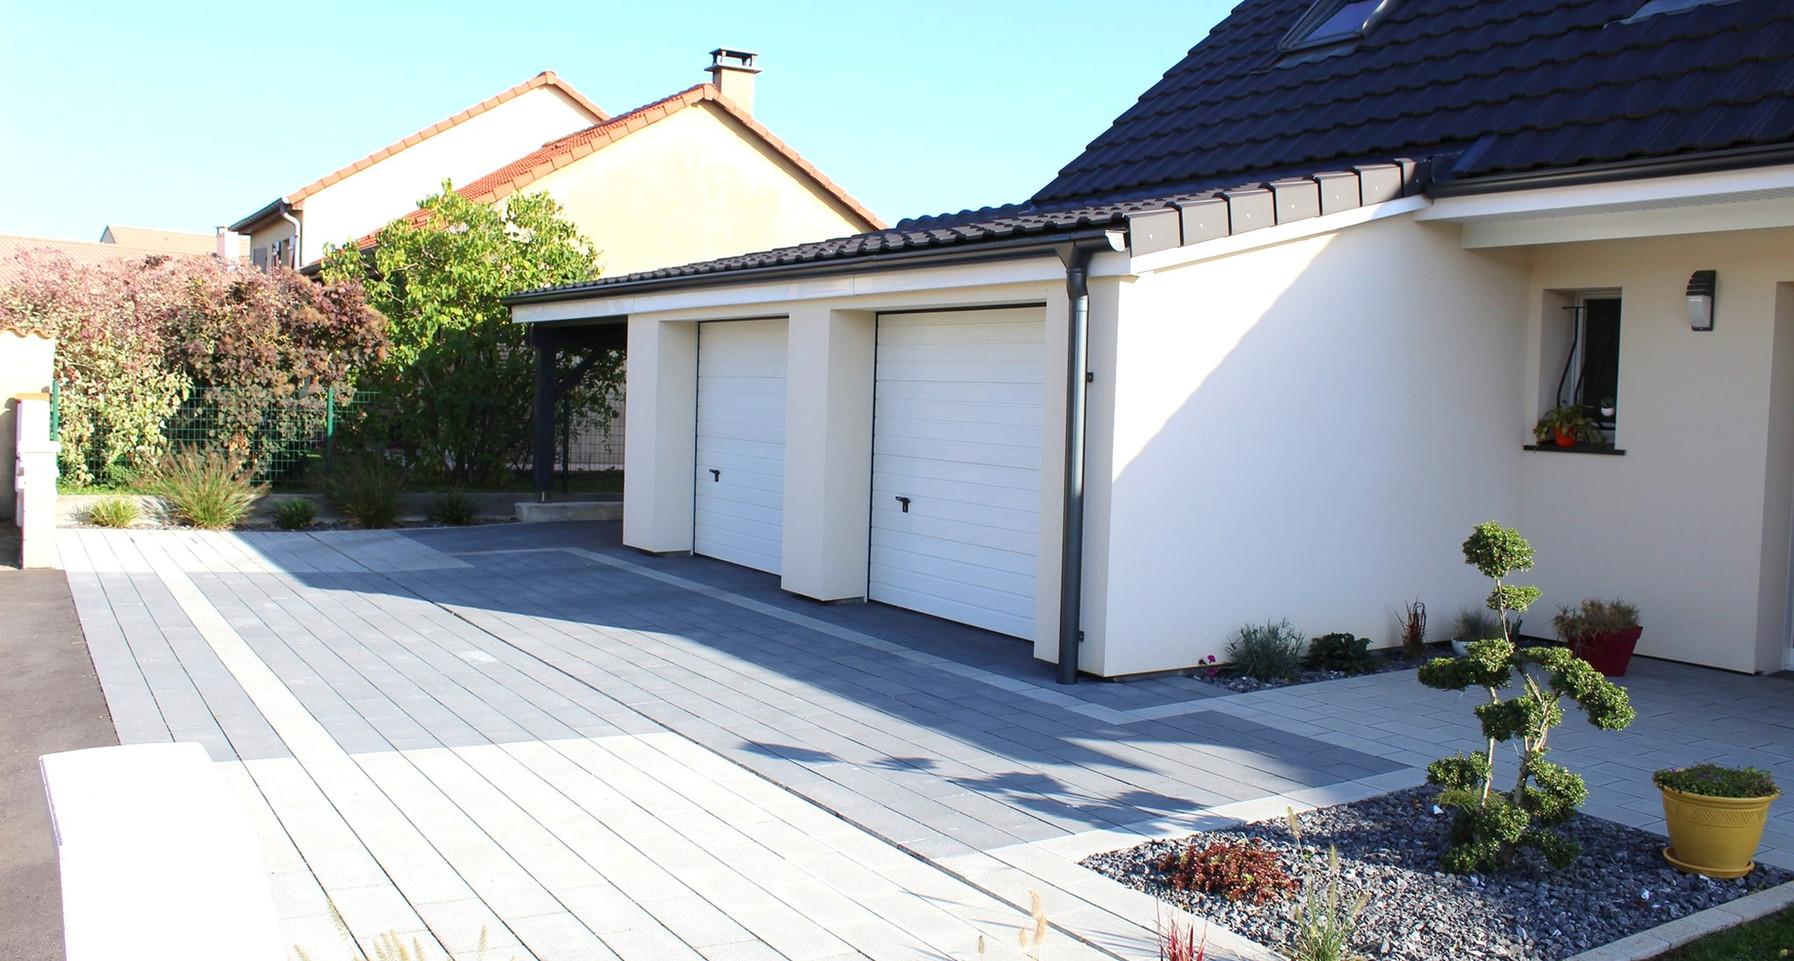 garage-pavage-qualite-paysage_edited.jpg